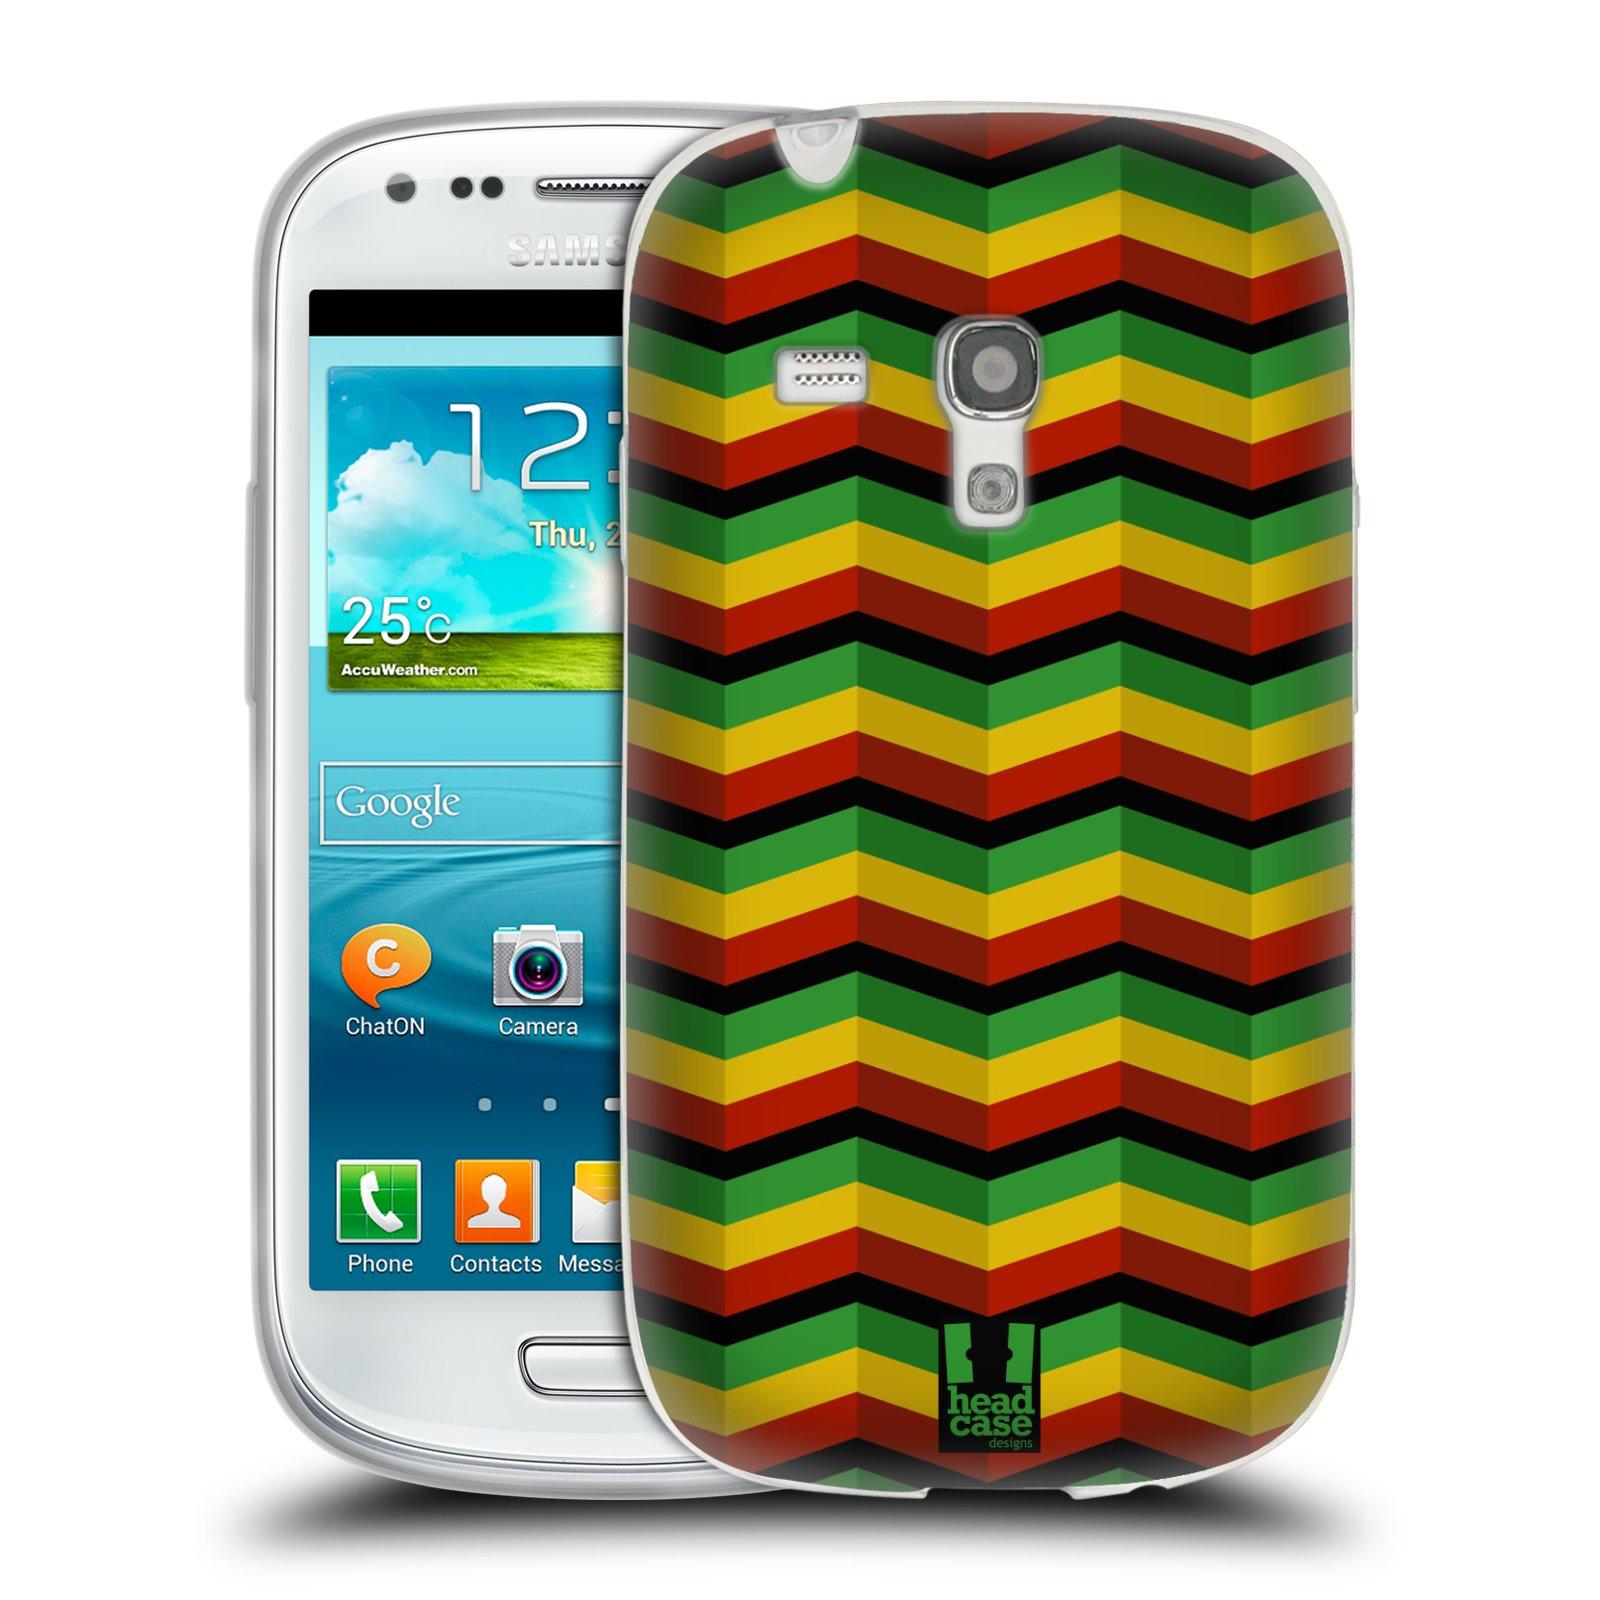 Silikonové pouzdro na mobil Samsung Galaxy S III Mini HEAD CASE RASTA CHEVRON (Silikonový kryt či obal na mobilní telefon Samsung Galaxy S III Mini GT-i8190)